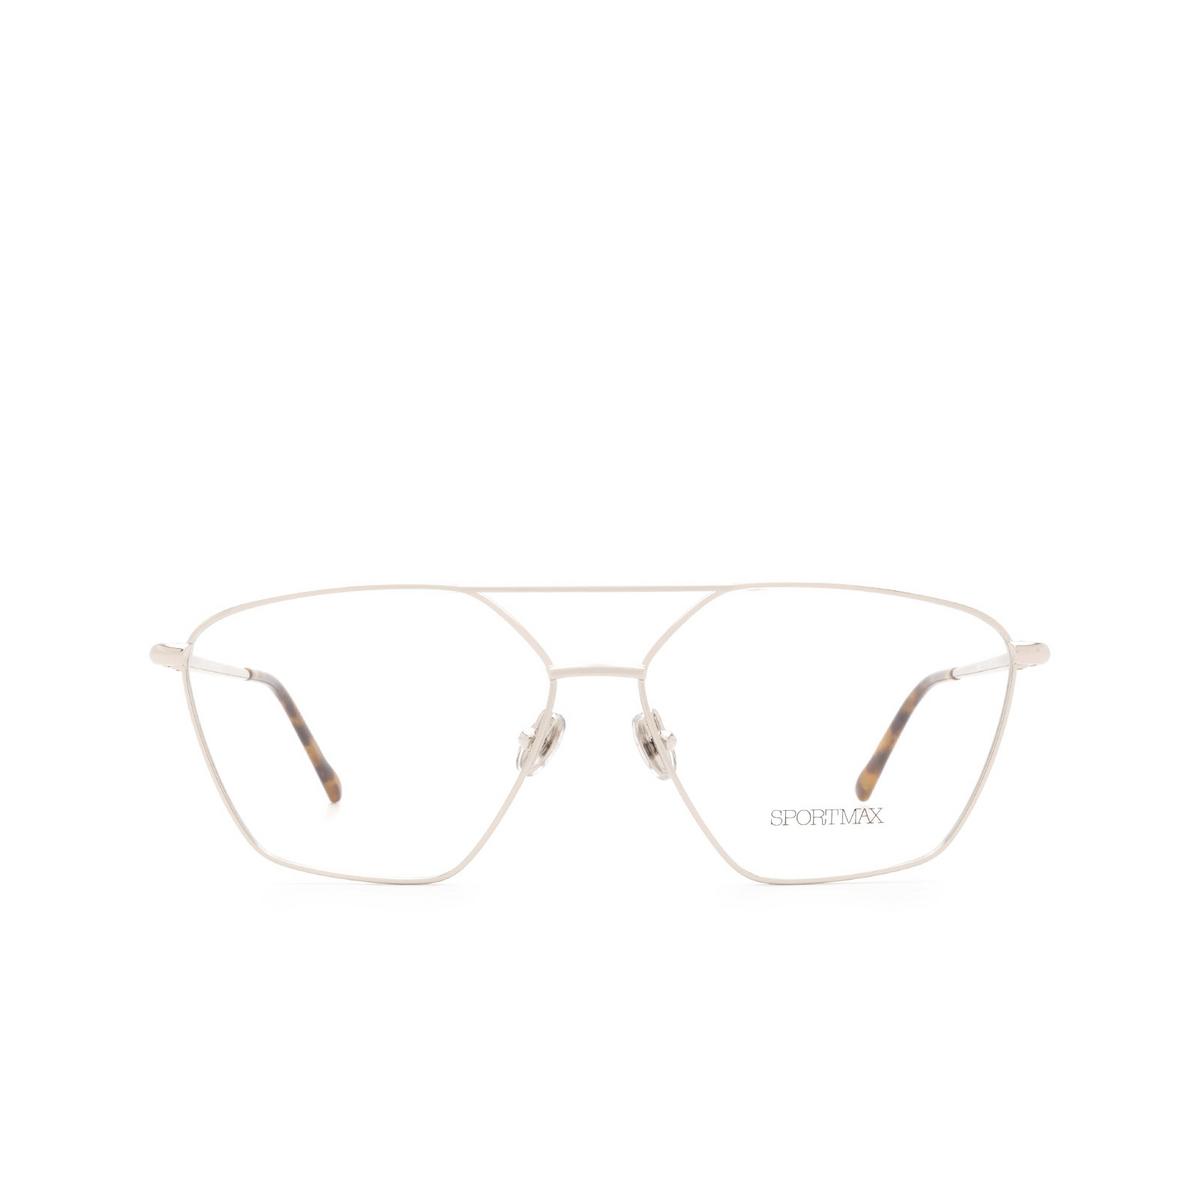 Sportmax® Irregular Eyeglasses: SM5009 color Grey 016.